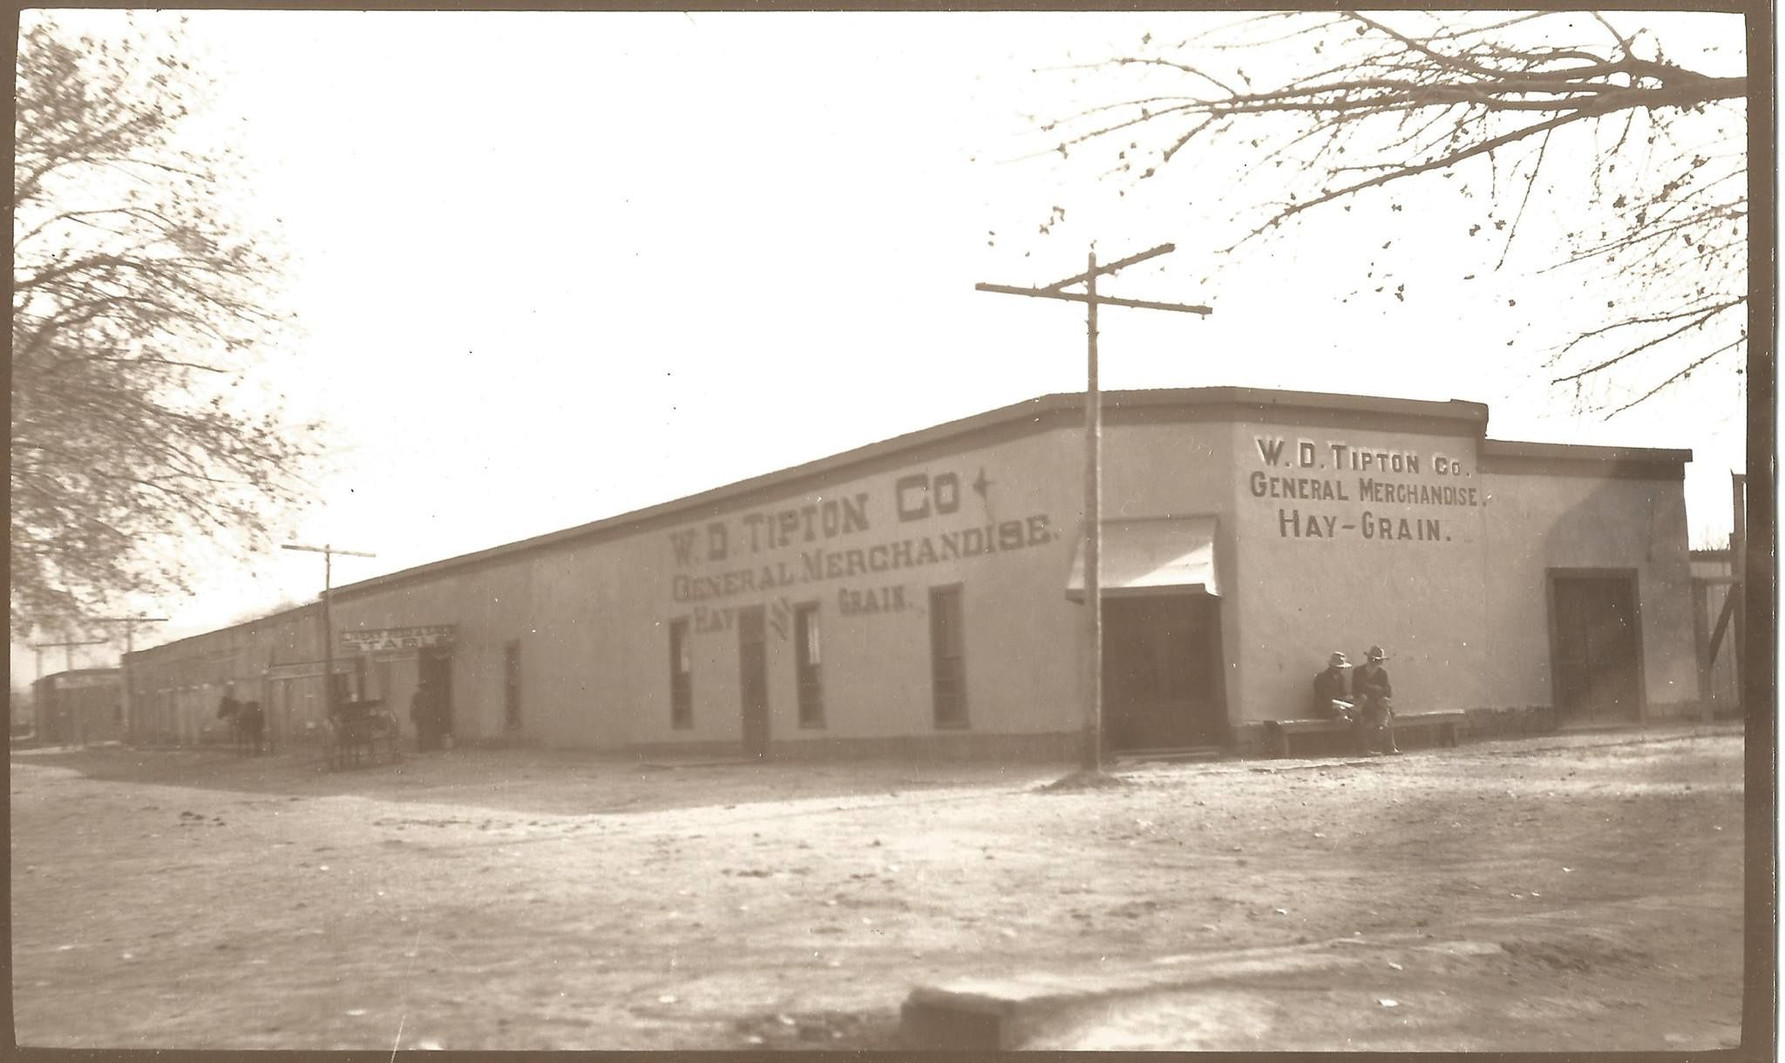 W.D. Tipton Company.